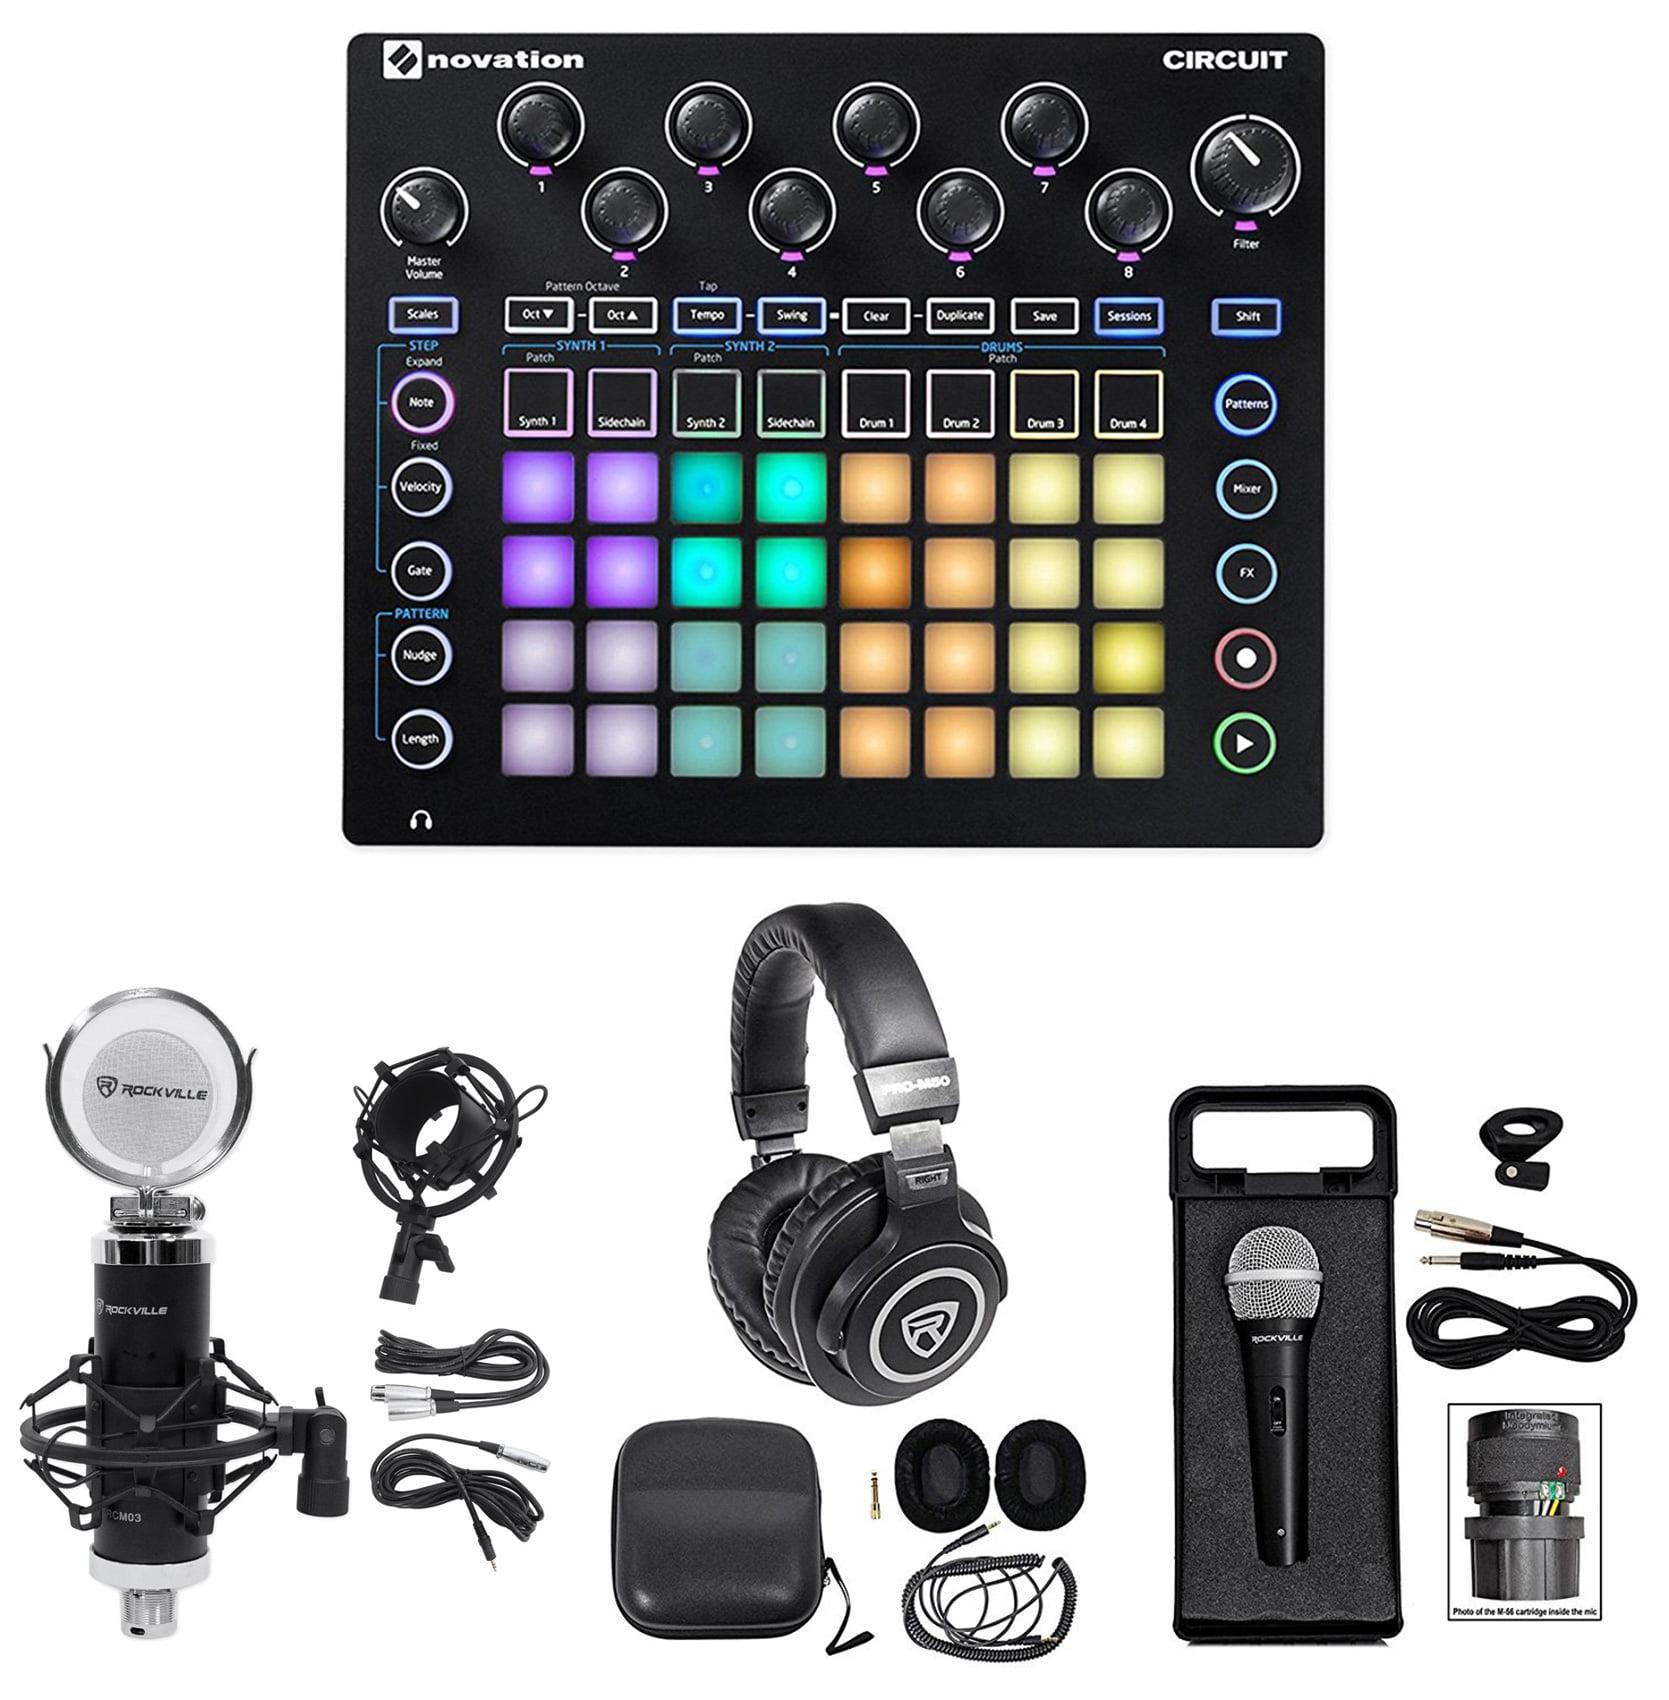 Novation CIRCUIT Groove Box Music Controller Pad Drum Machine+2) Mics+Headphones by NOVATION